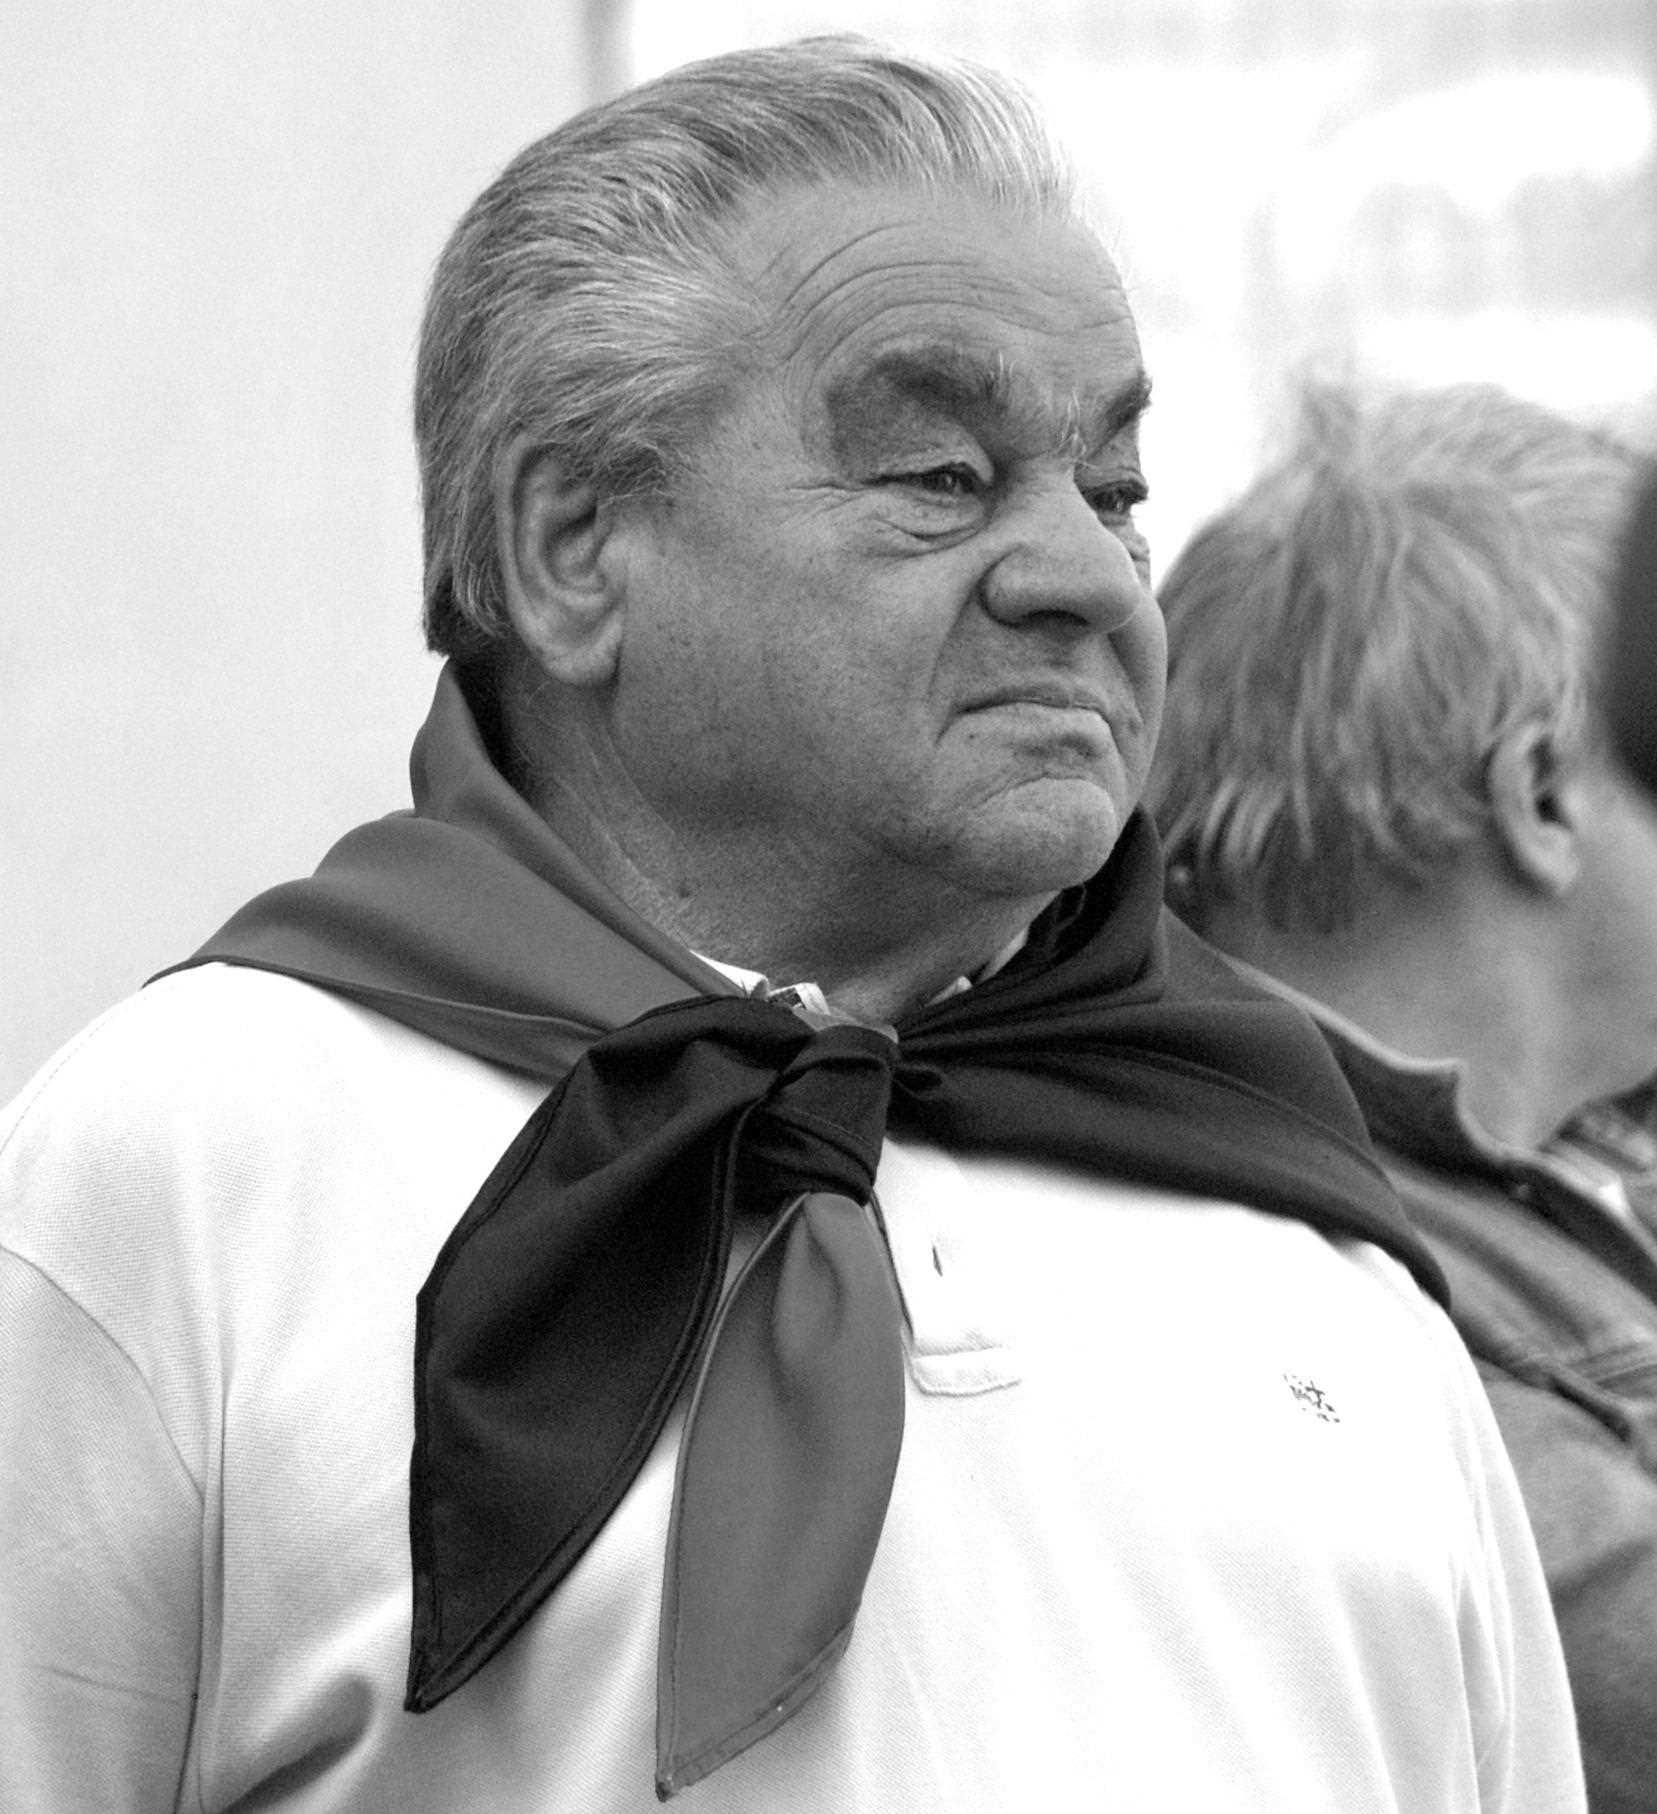 Mauro Franchini